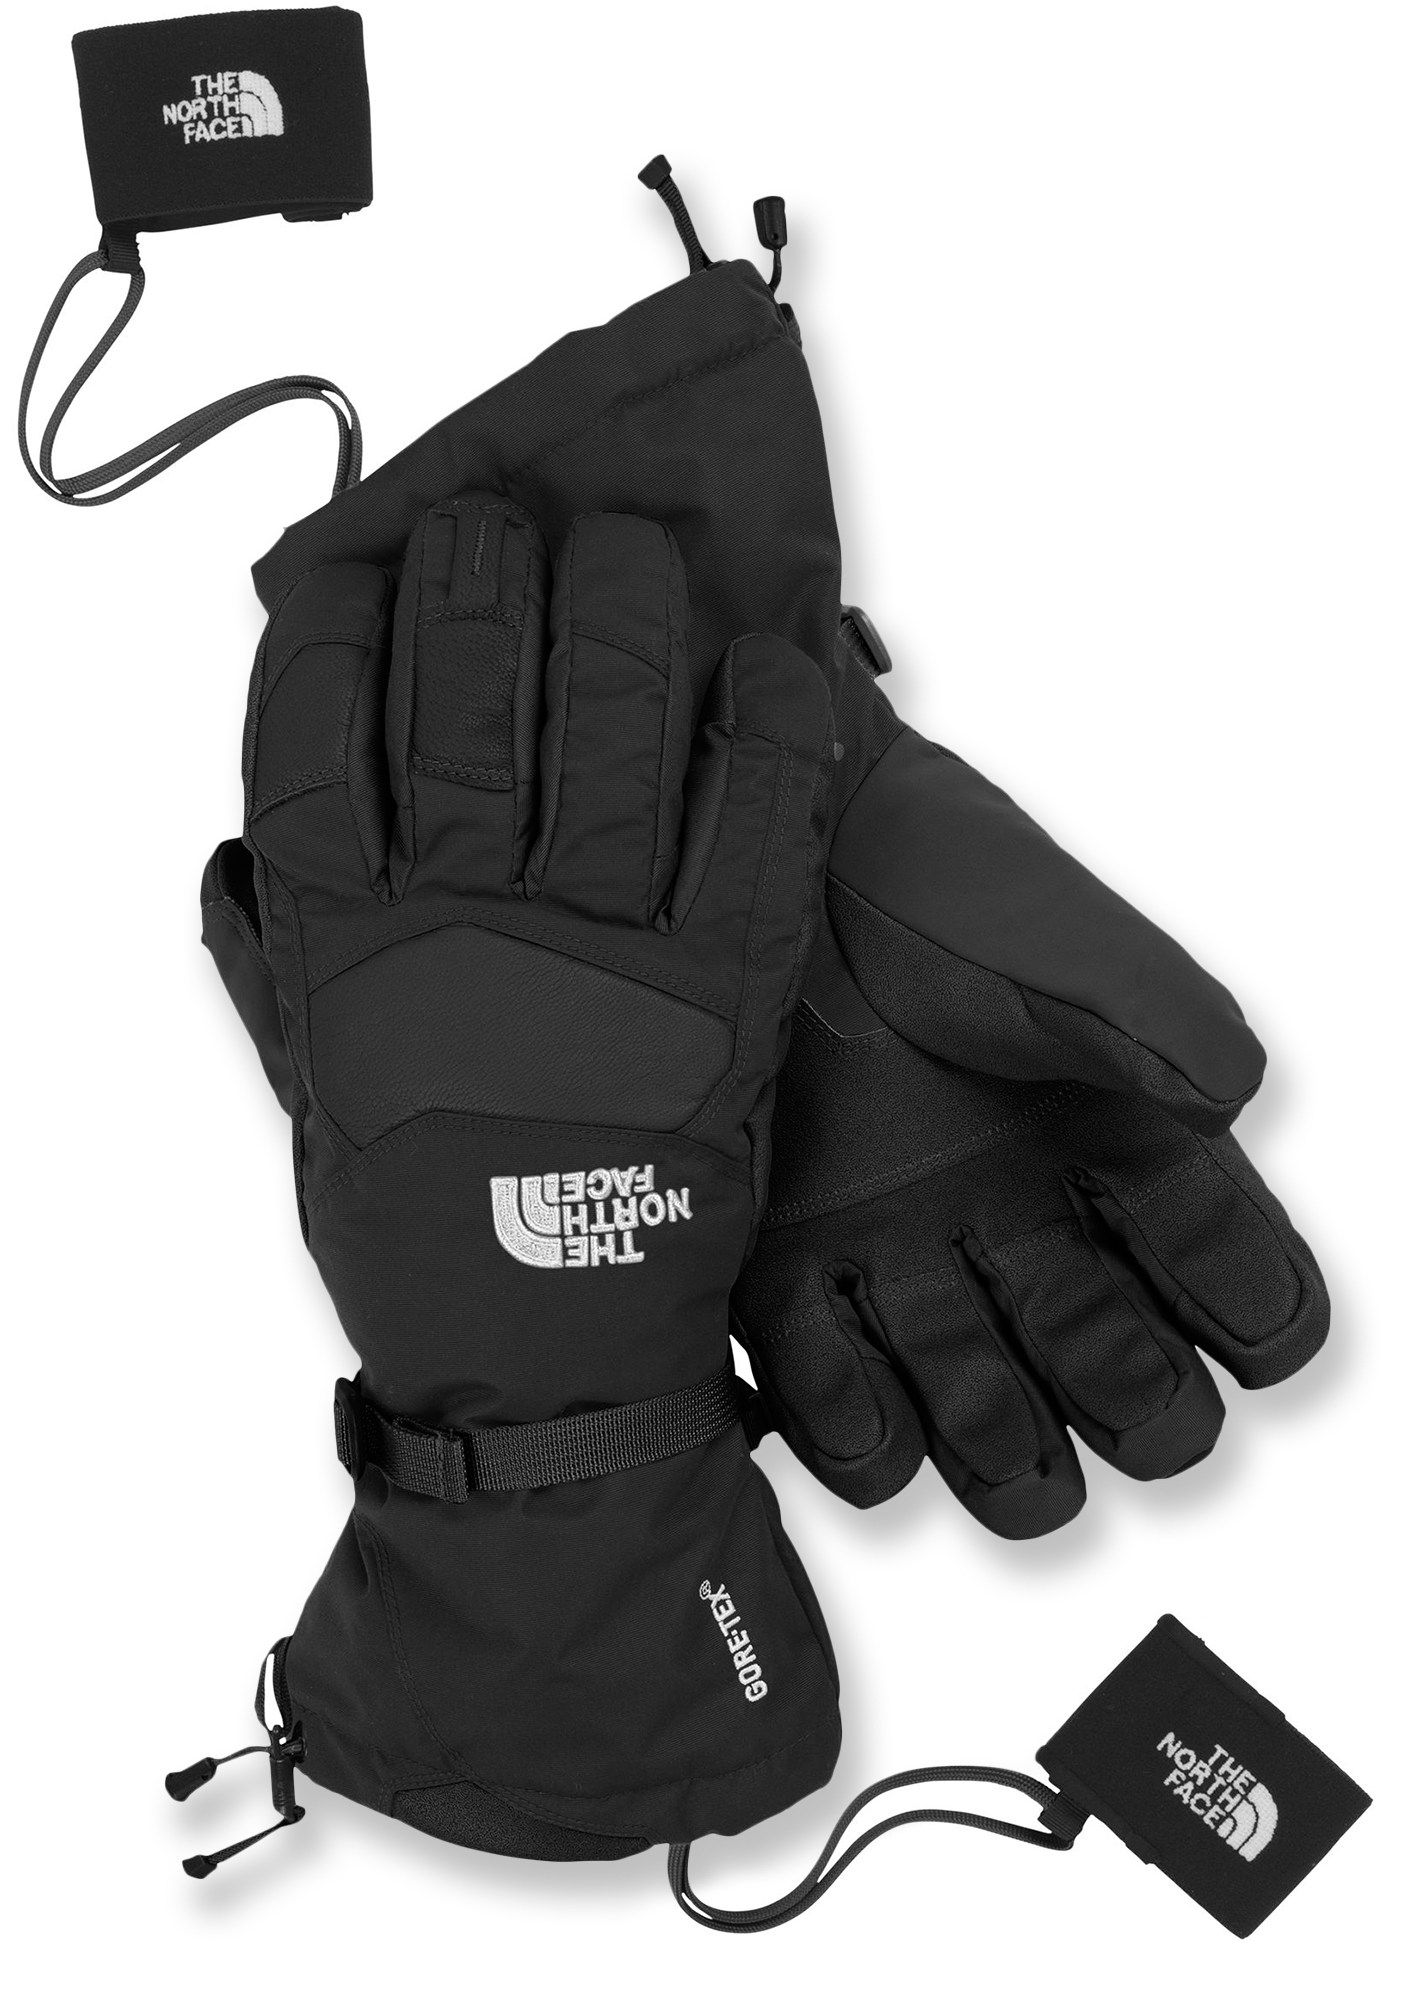 0a9b226aa22afa Powdercloud Gloves - Men's in 2019   *Apparel & Accessories*   Mens ...